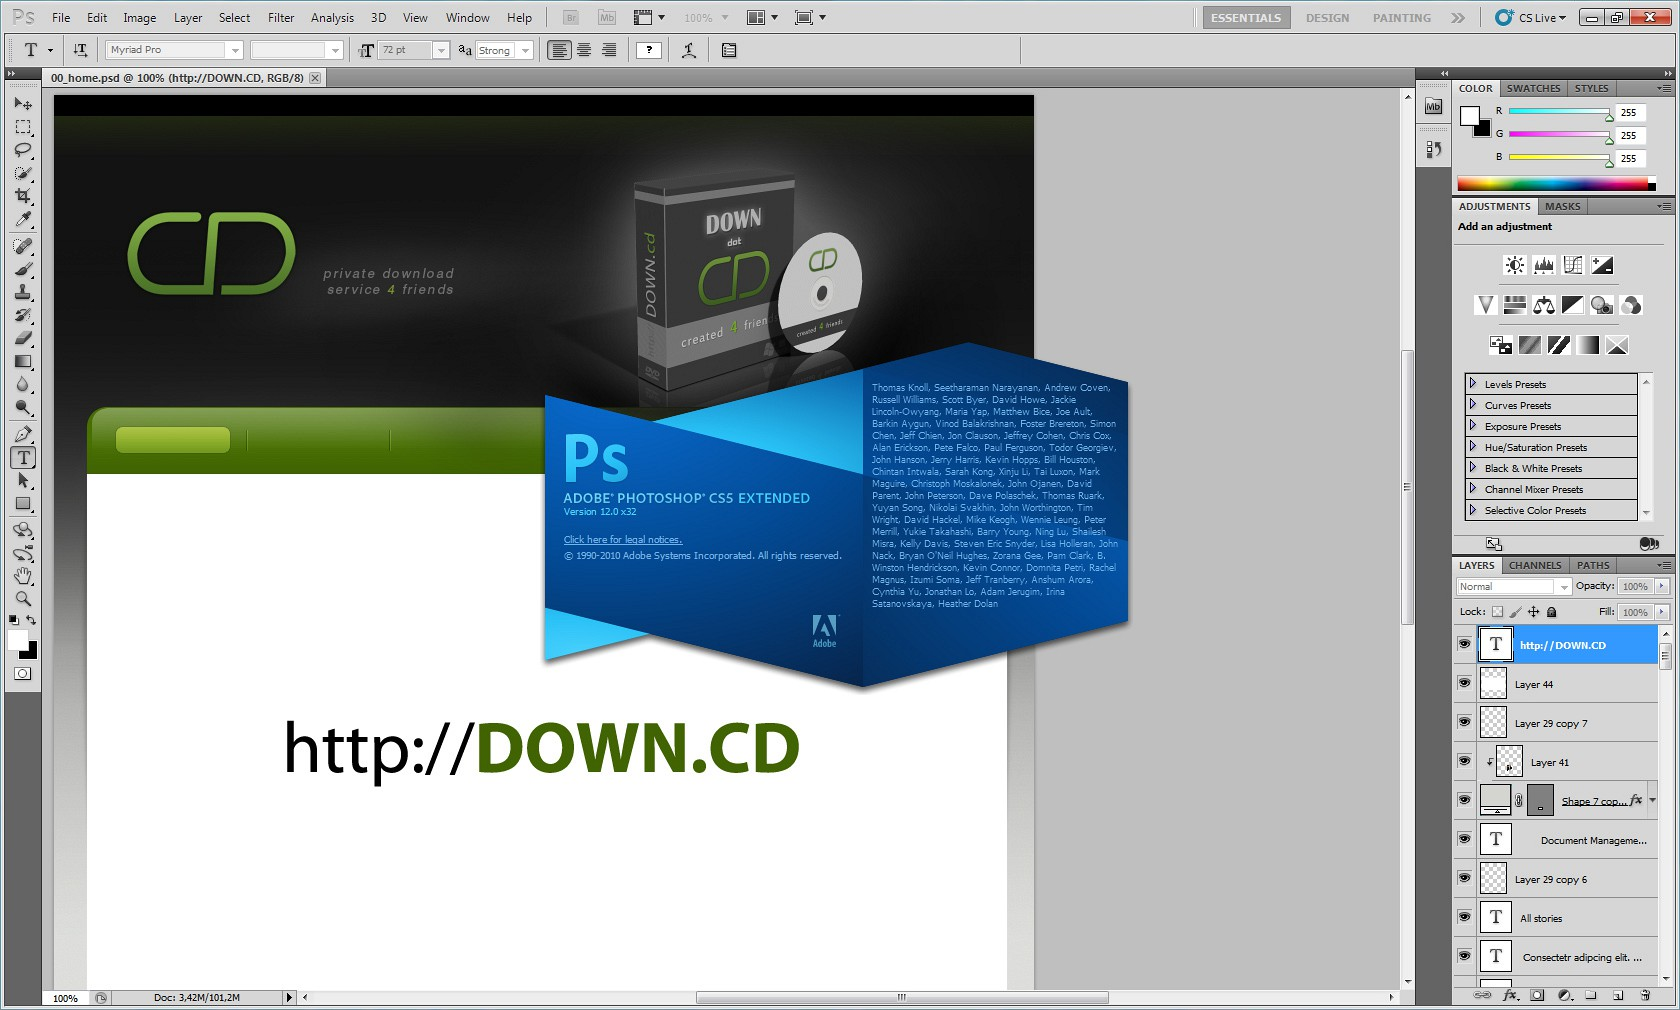 Adobe Photoshop CS5 12.0 Extended screenshot ...